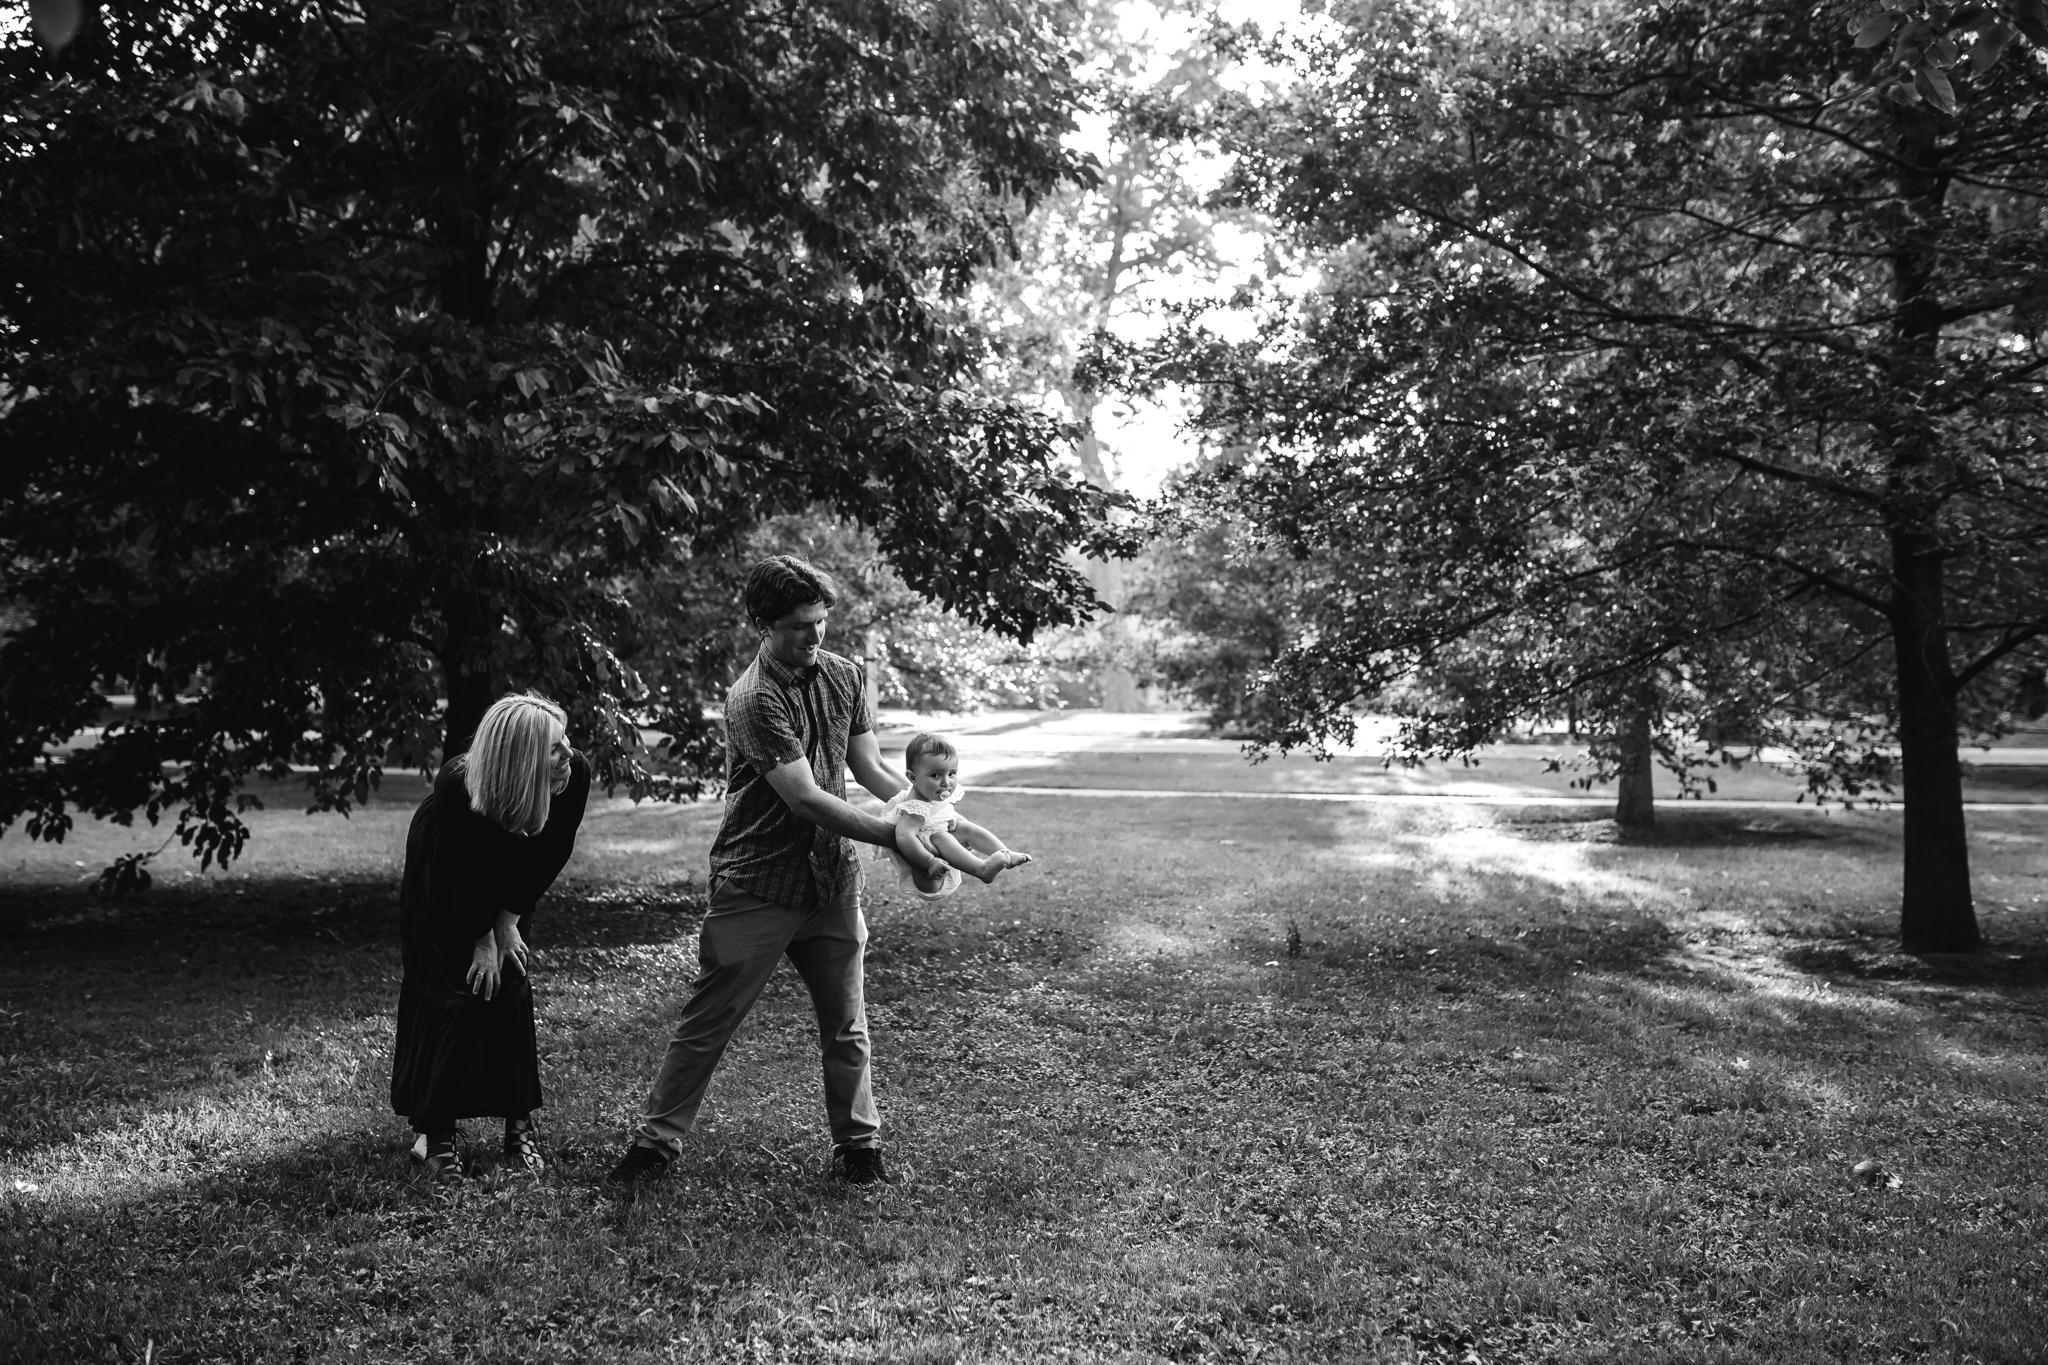 memphis-family-photographer-thewarmtharoundyou-overton-park (17 of 20).jpg